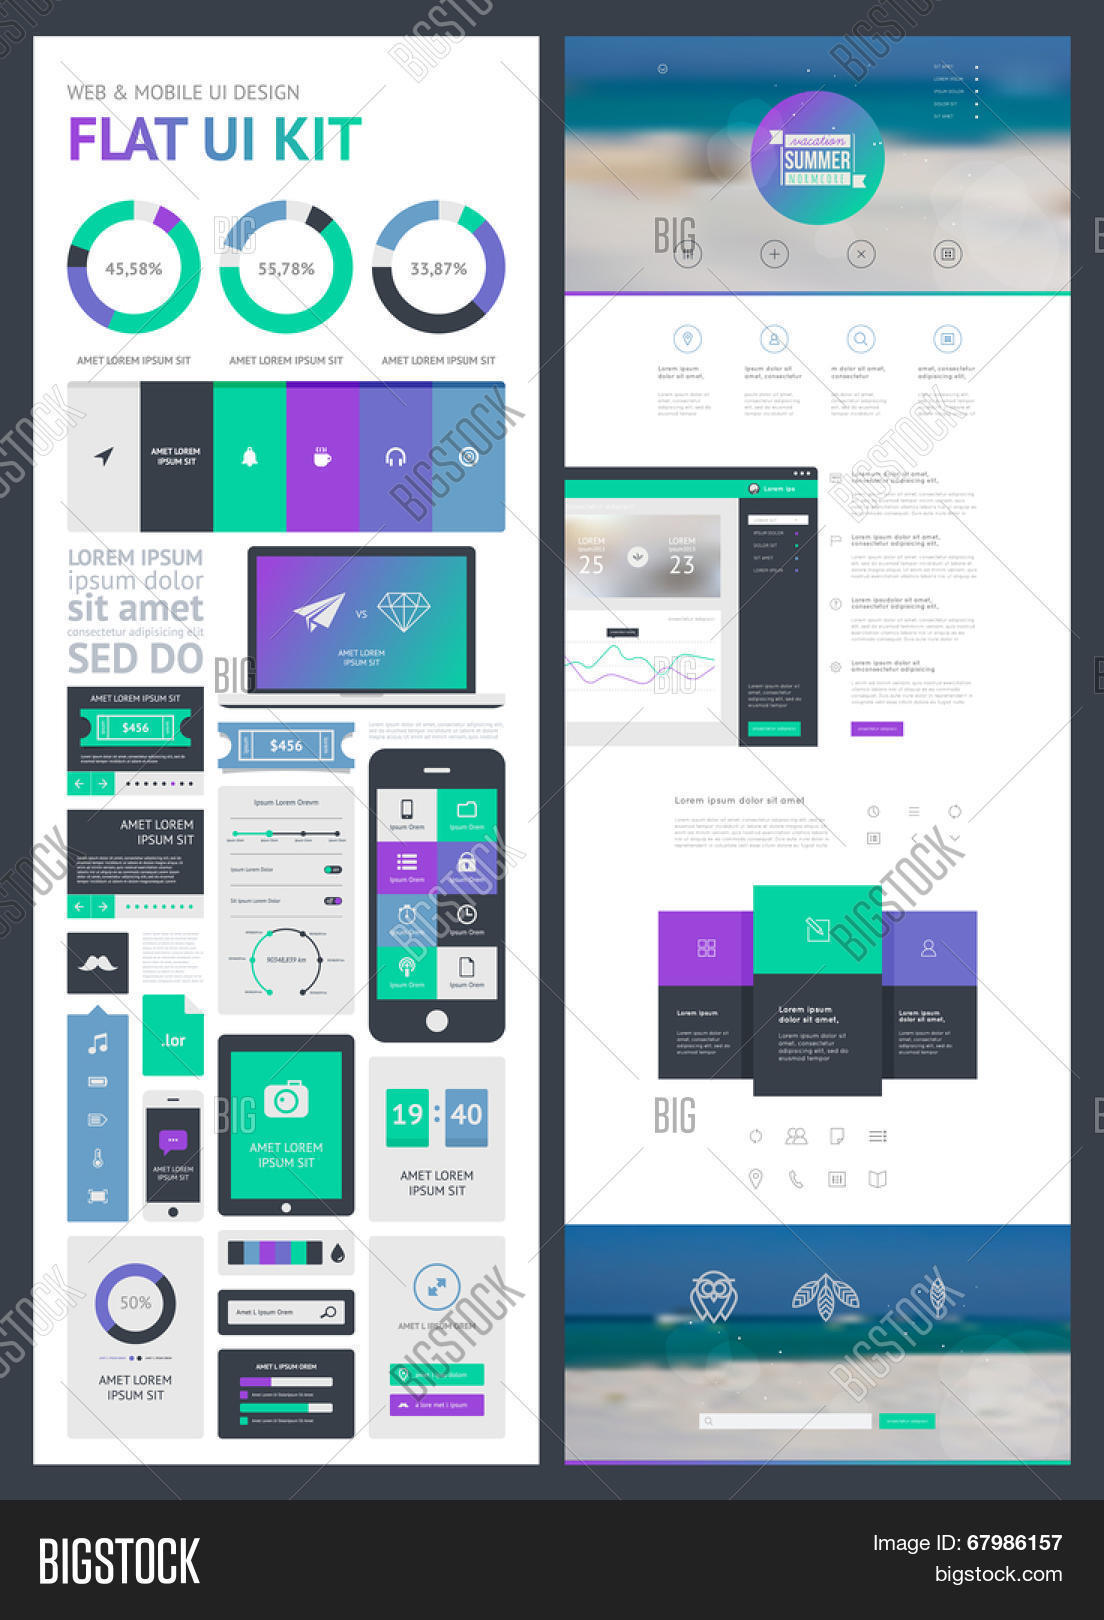 flat UI kit for web and mobile, UI design, page website design ...